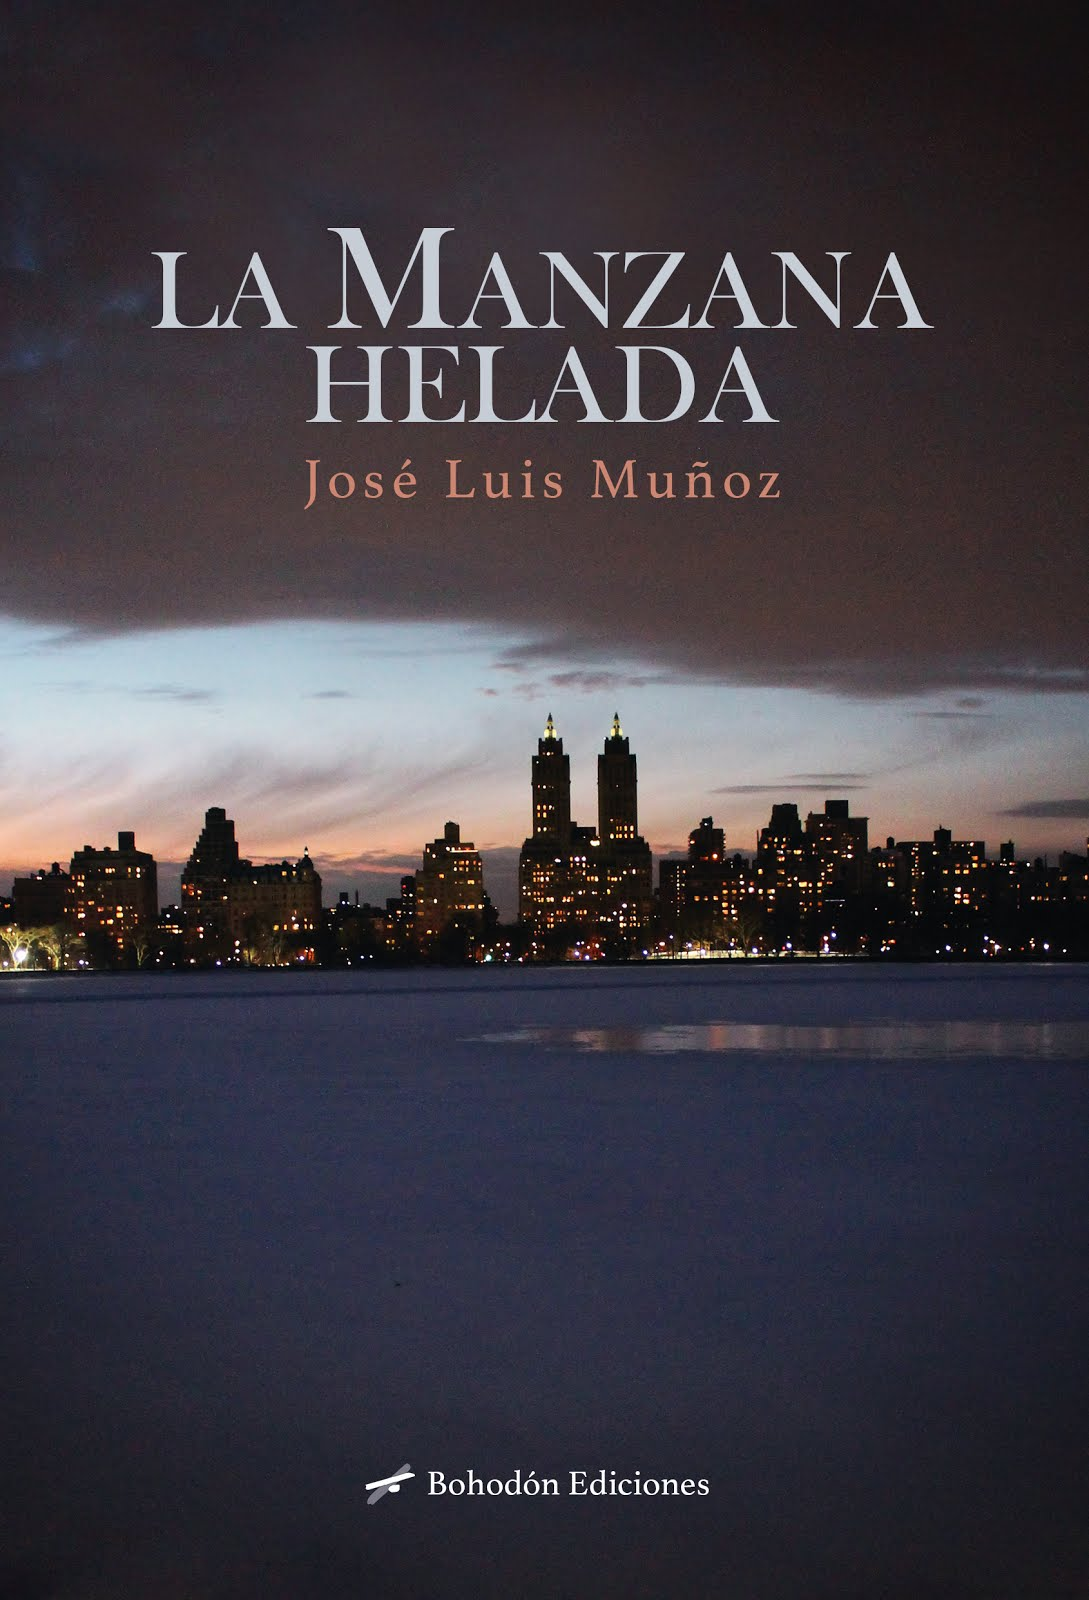 La Manzana Helada,